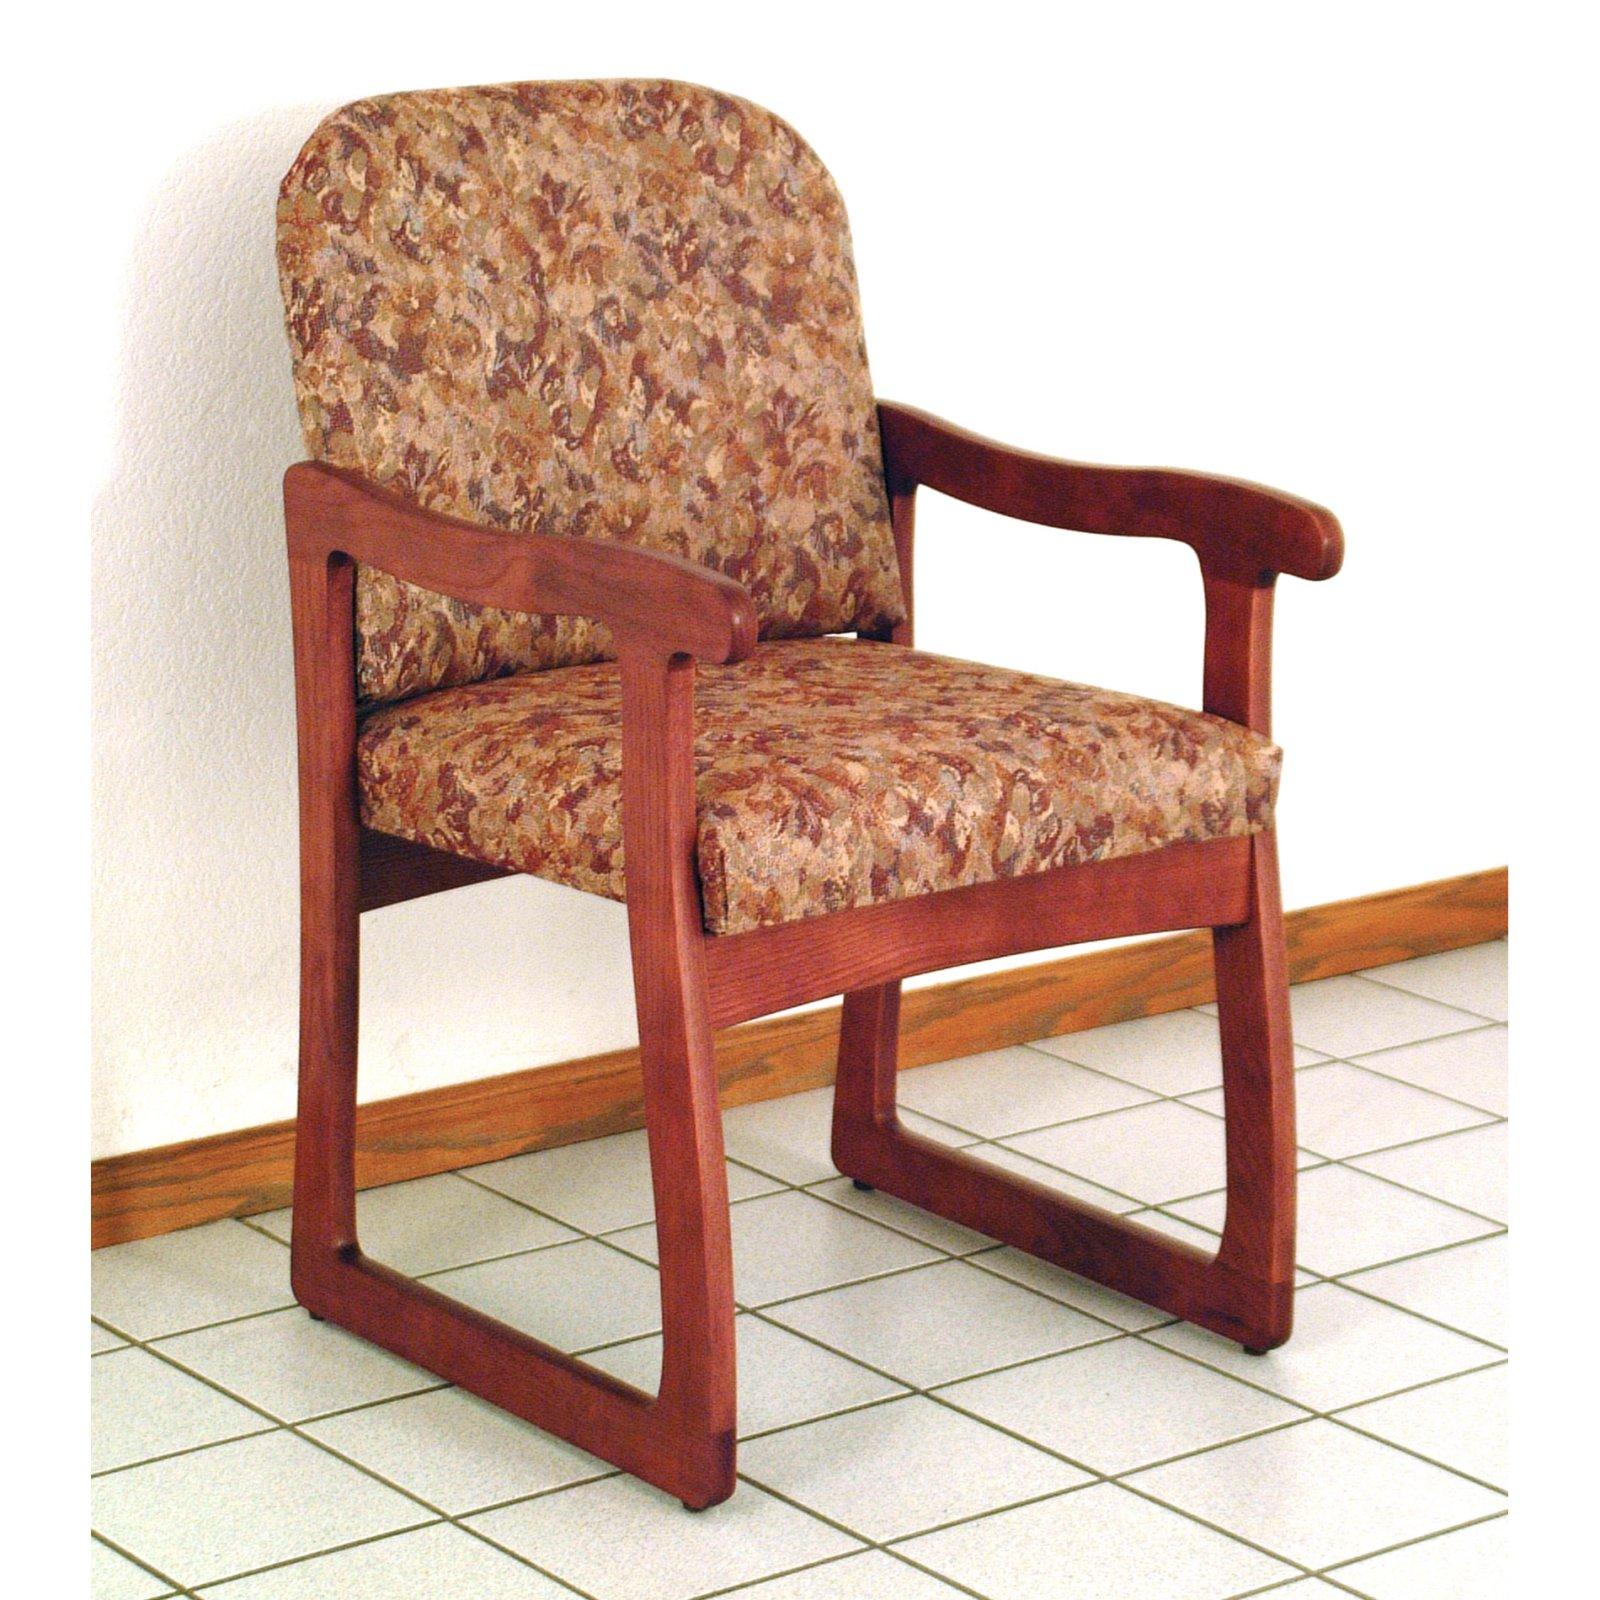 Wooden Mallet DW7-1 Solid Oak Guest Chair